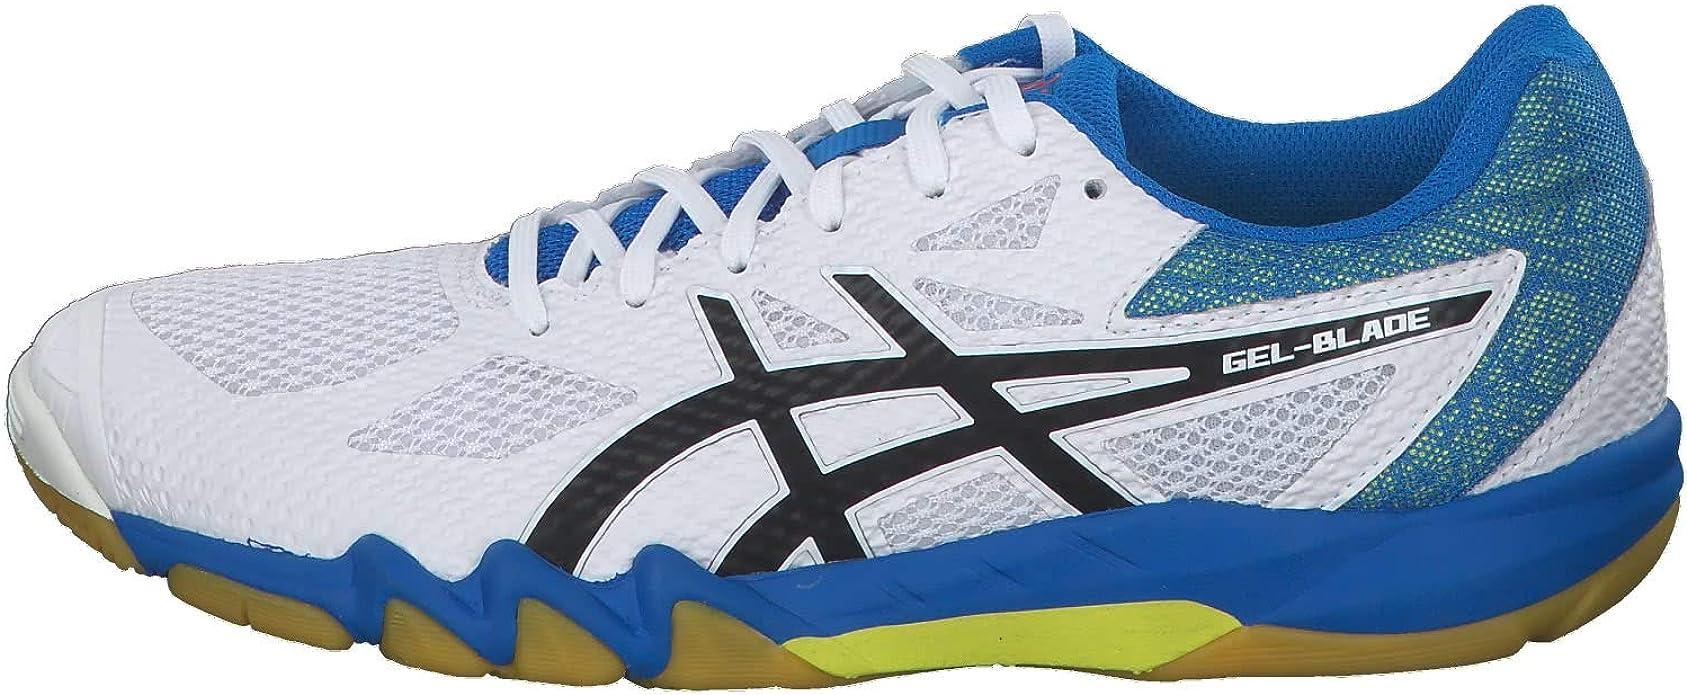 ASICS Gel Blade 7 Chaussure Sport en Salle AW19 49: Amazon